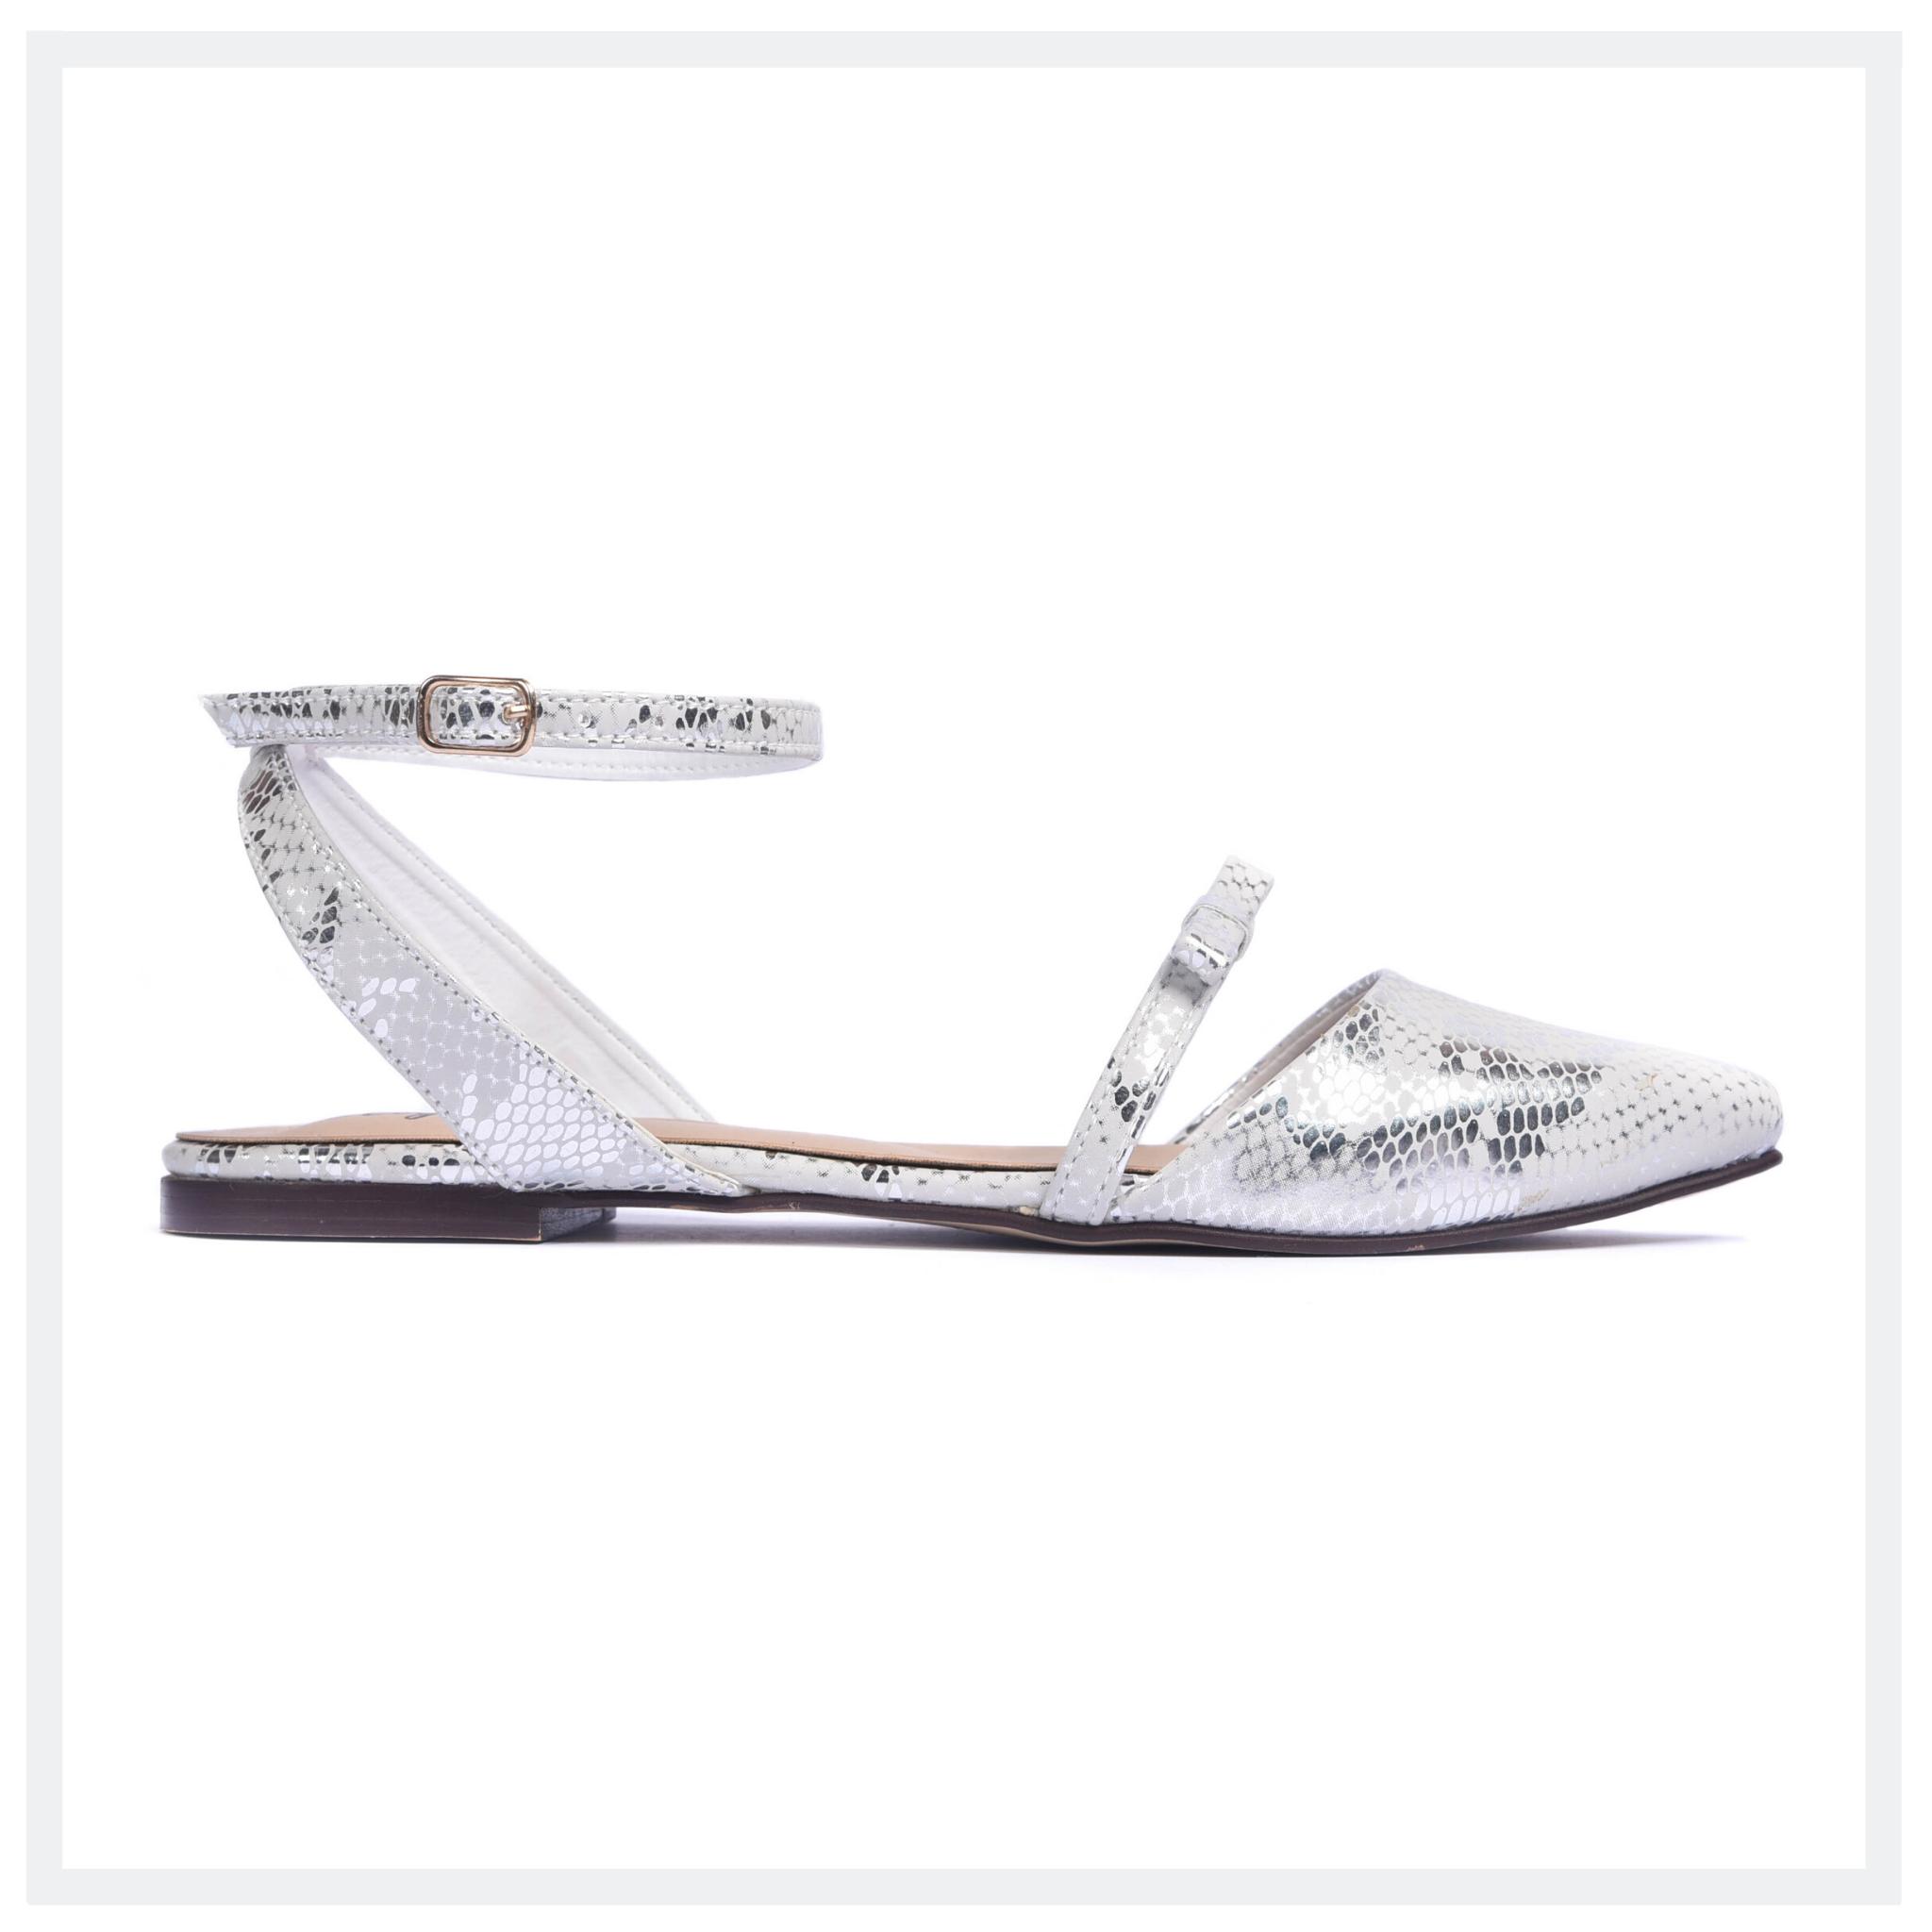 NICHOLES  Women's Flat Bow Pumps  White  Elegancia